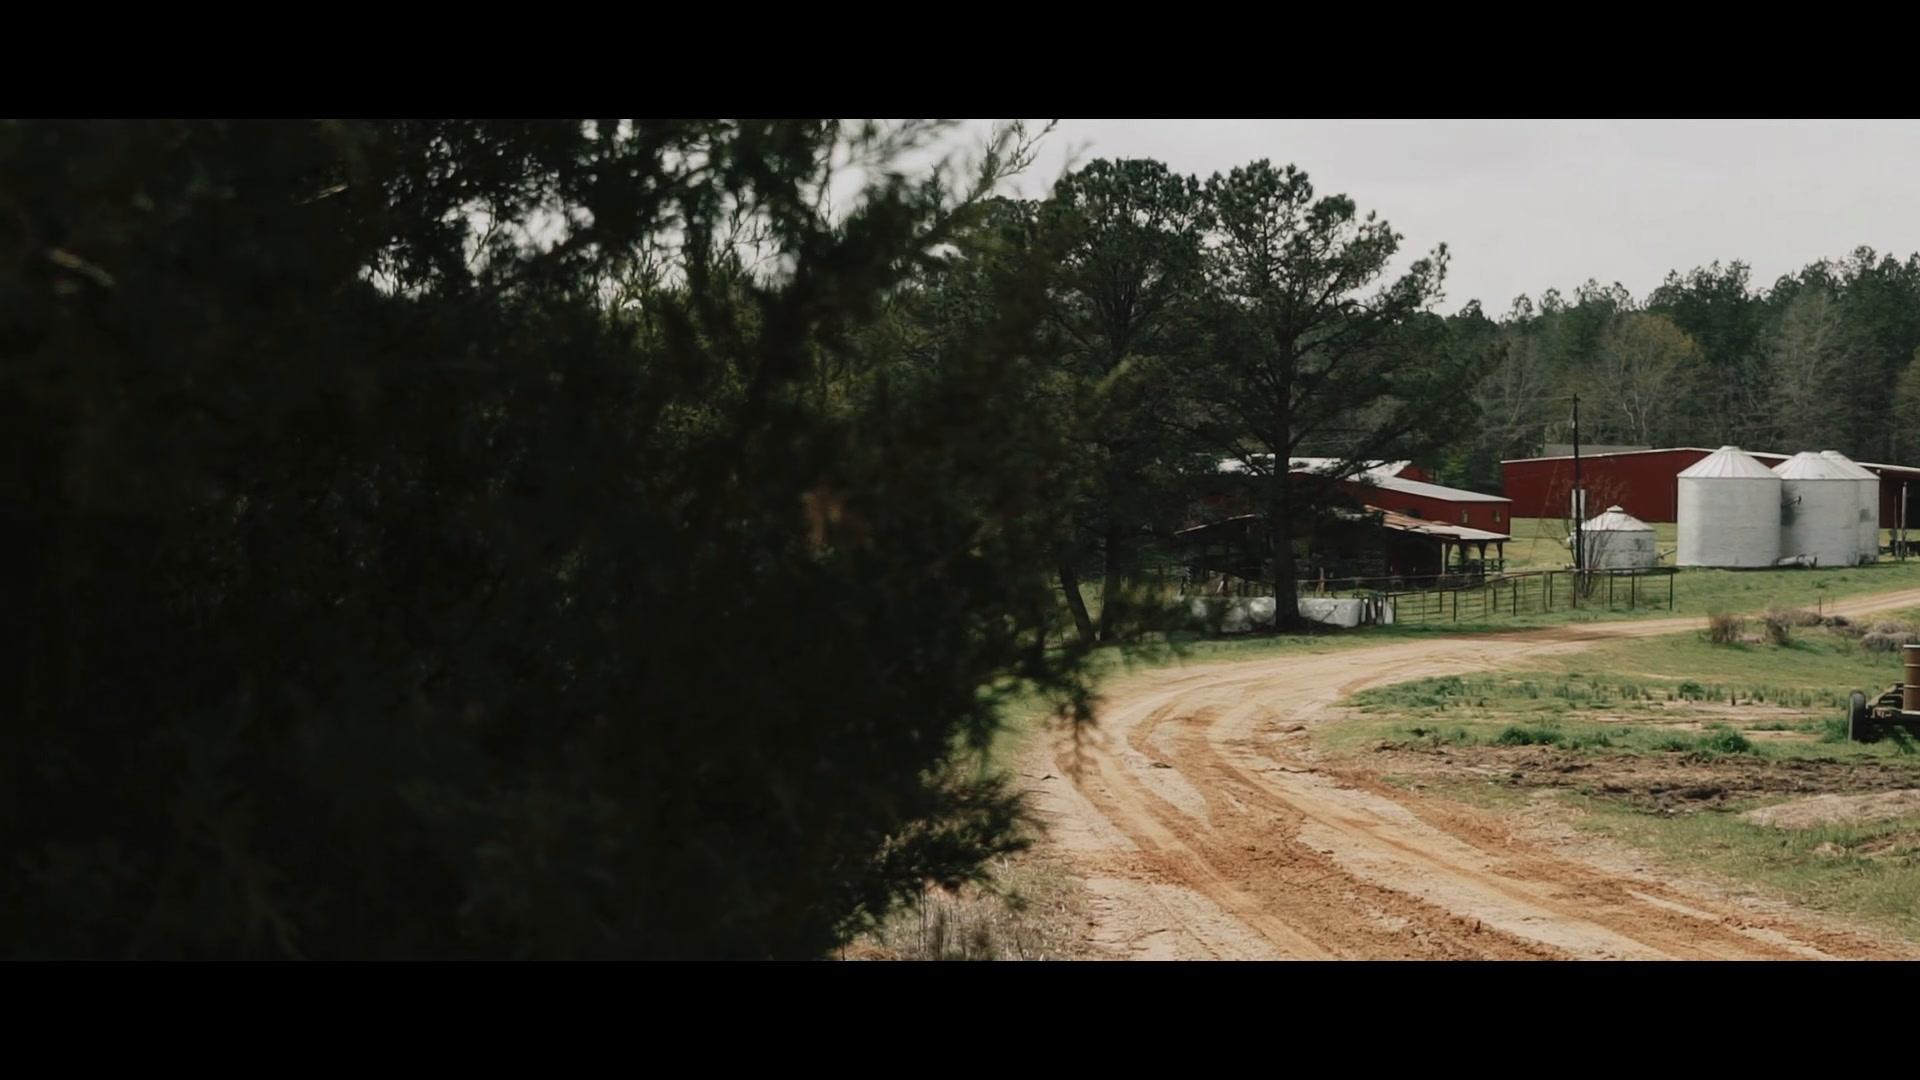 McKenzie + Wesley | Grenada, Mississippi | Private Farm, Grenada